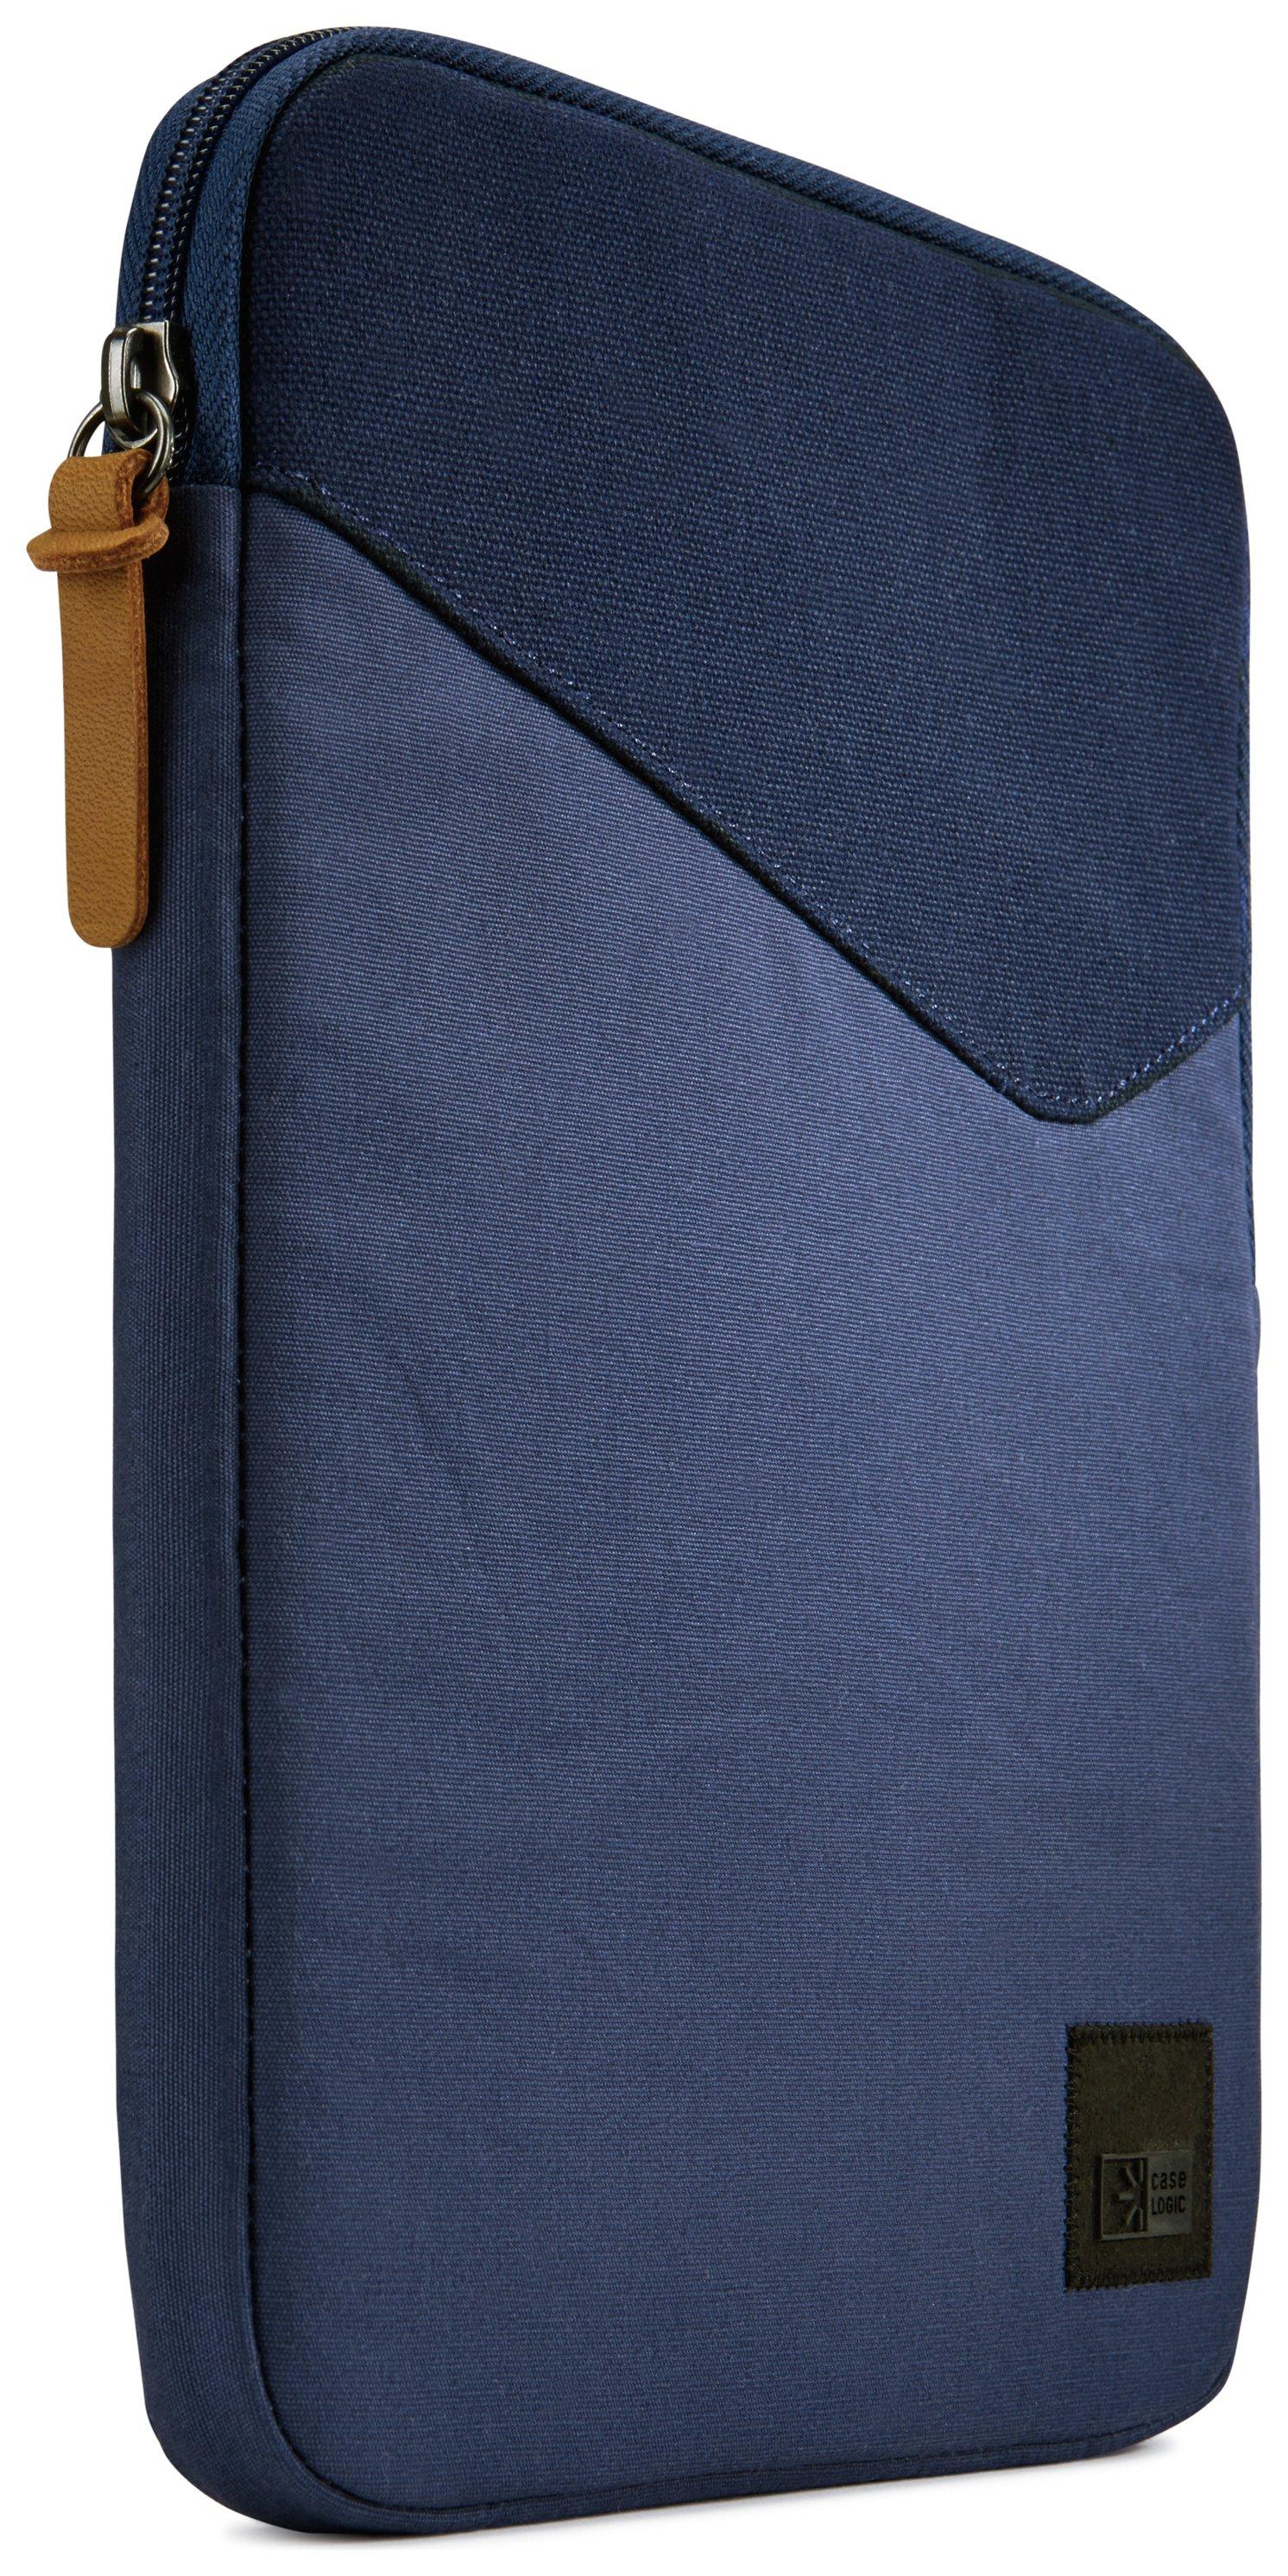 Image of Case Logic Lodo 10.1 Inch Tablet Sleeve - Blue.